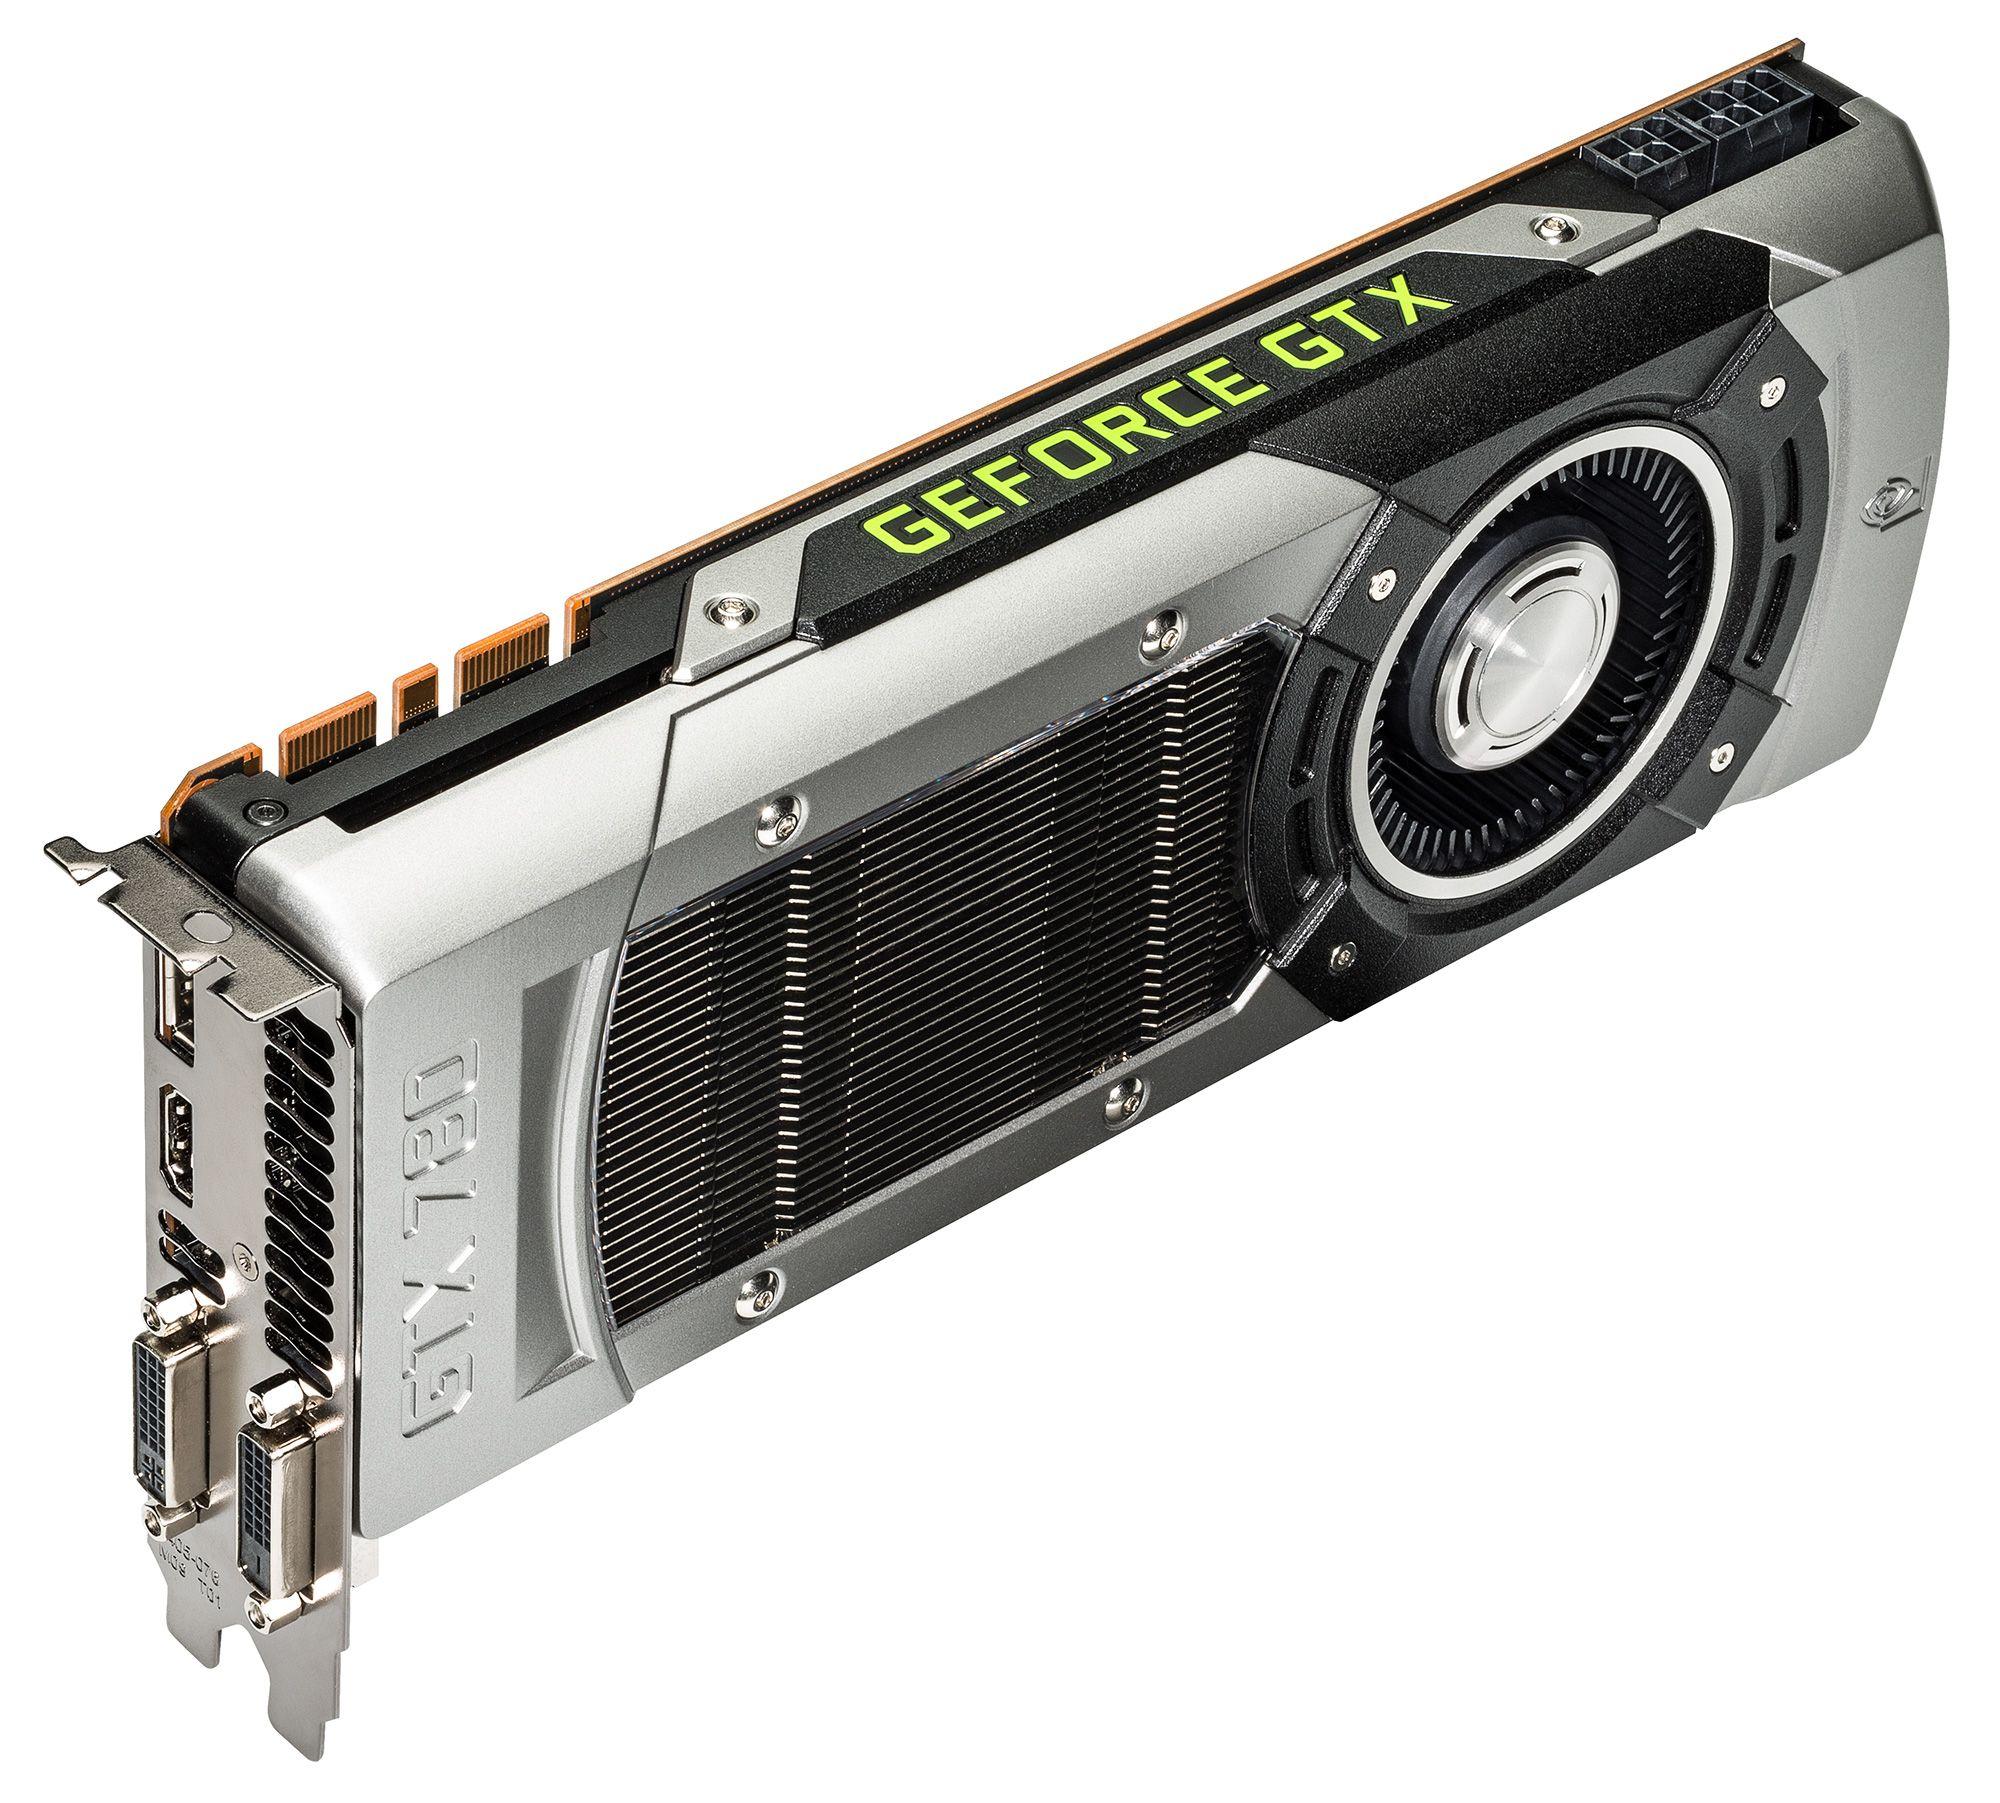 Nvidia GeForce GTX 780.Foto: Nvidia